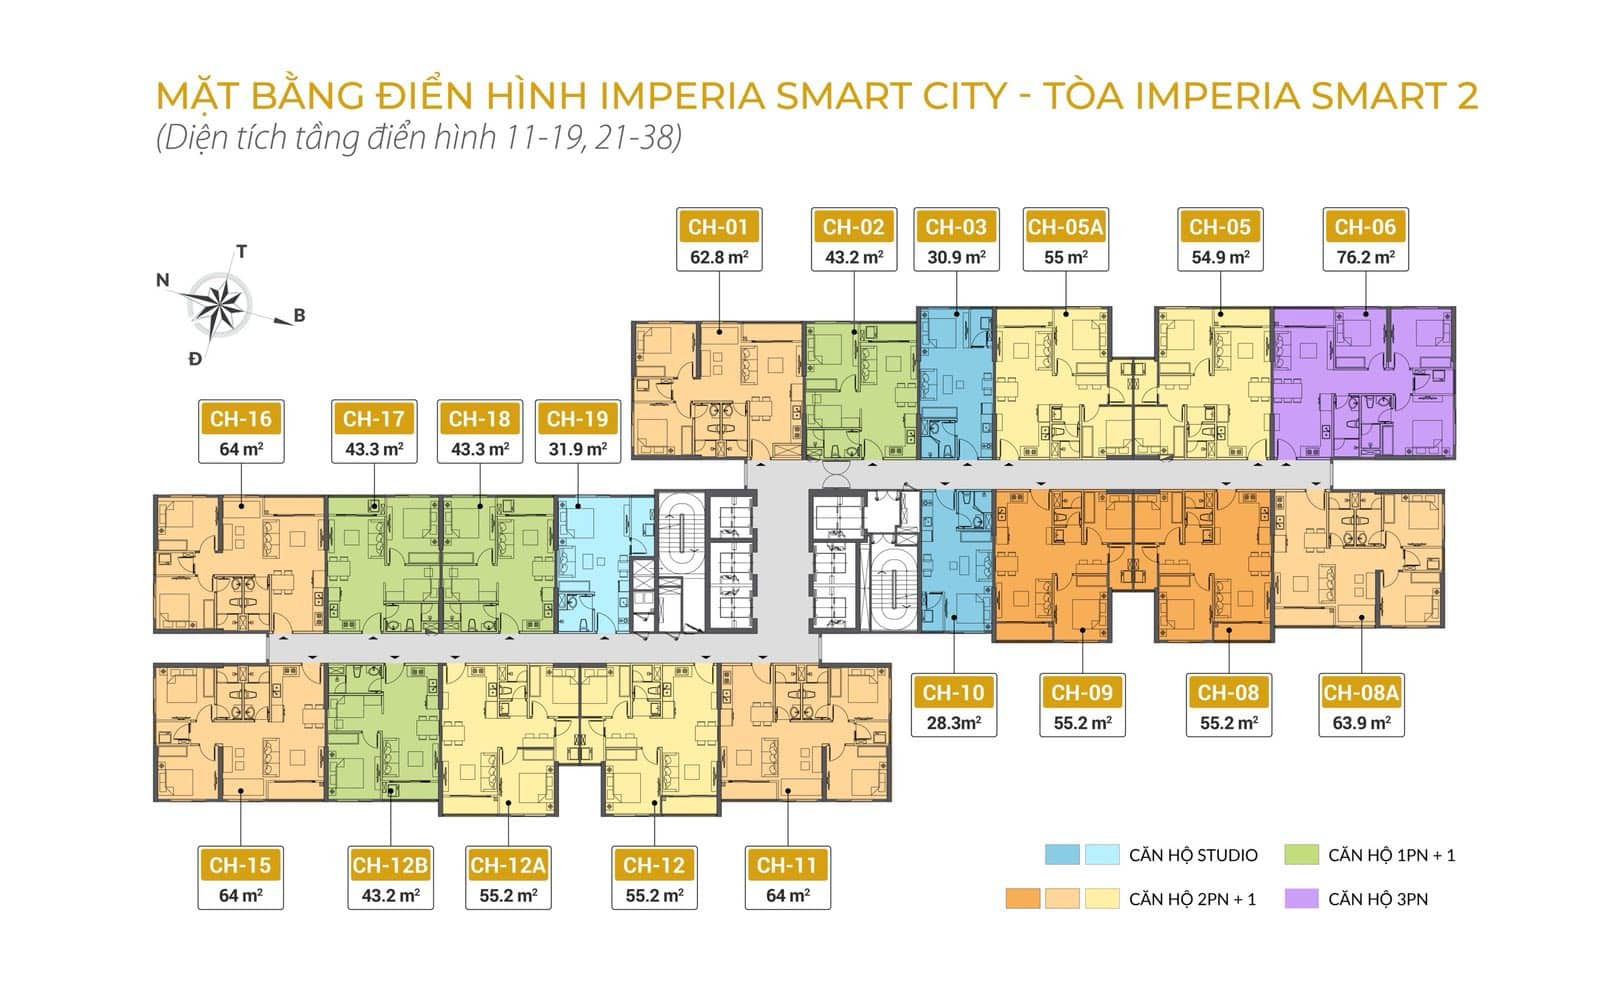 Mặt bằng Tòa Smart 2 Dự án MIK Imperia Smart City